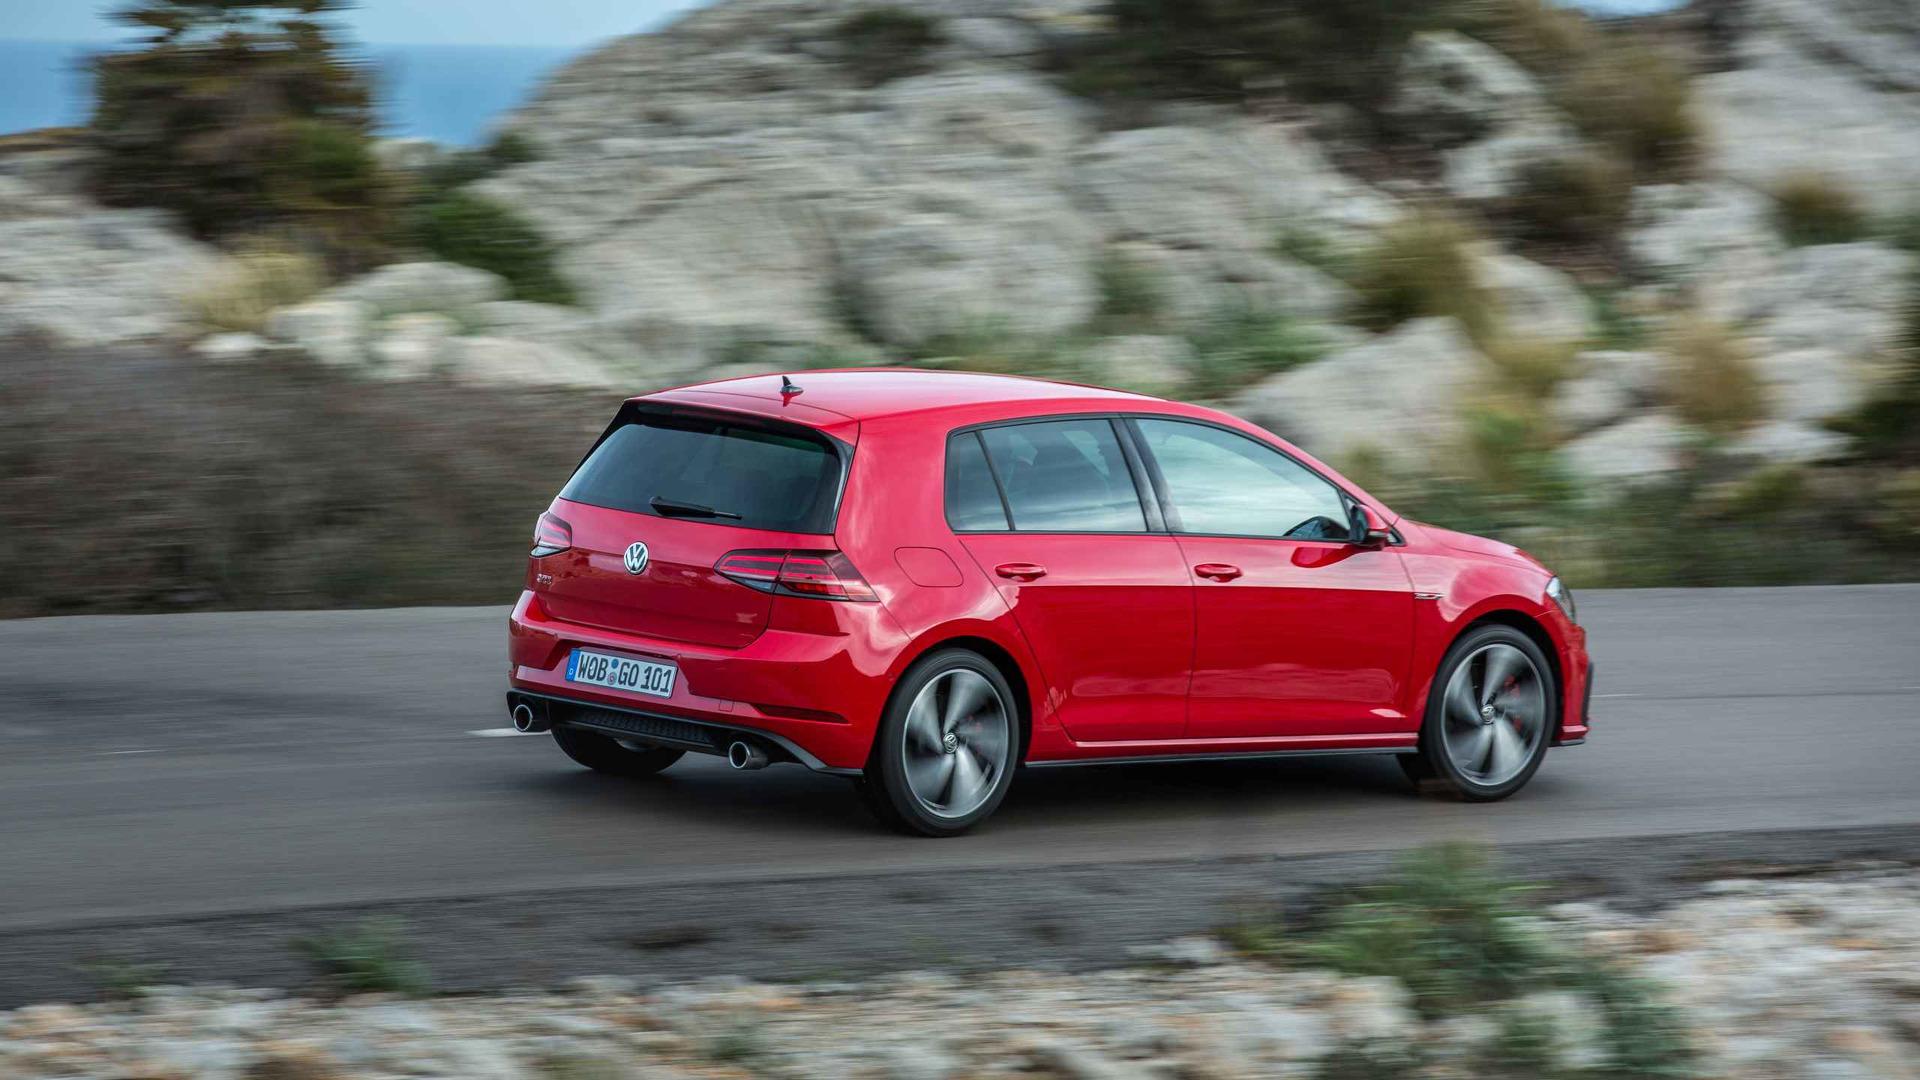 Volkswagen Golf Gti Vs R Which Should You Buy